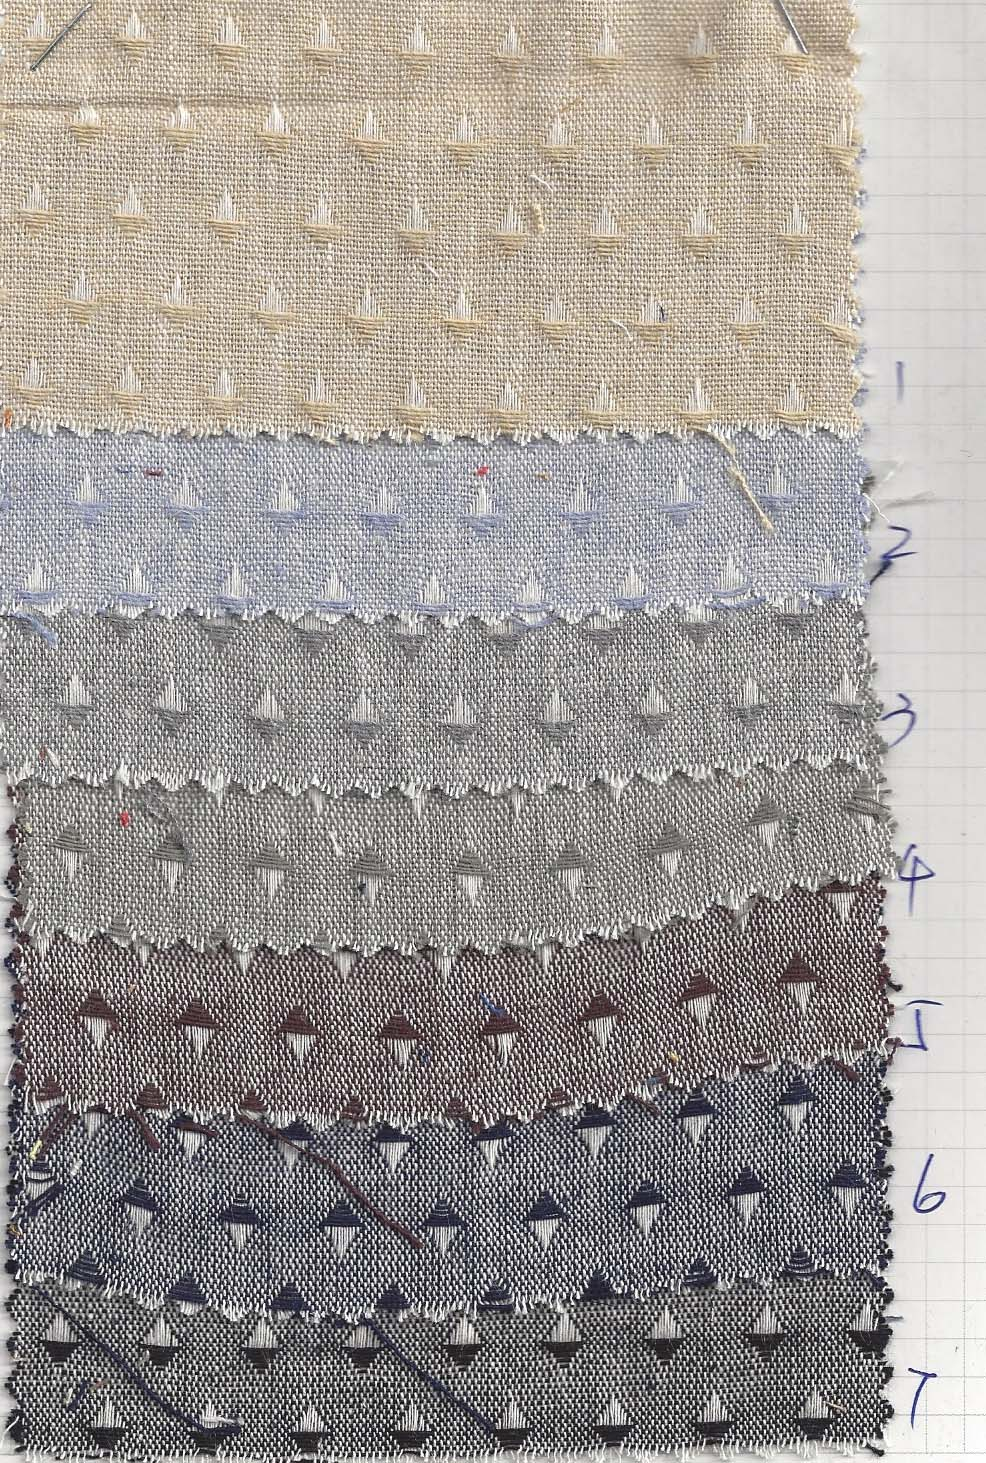 Xiangyi Textile N35.jpg